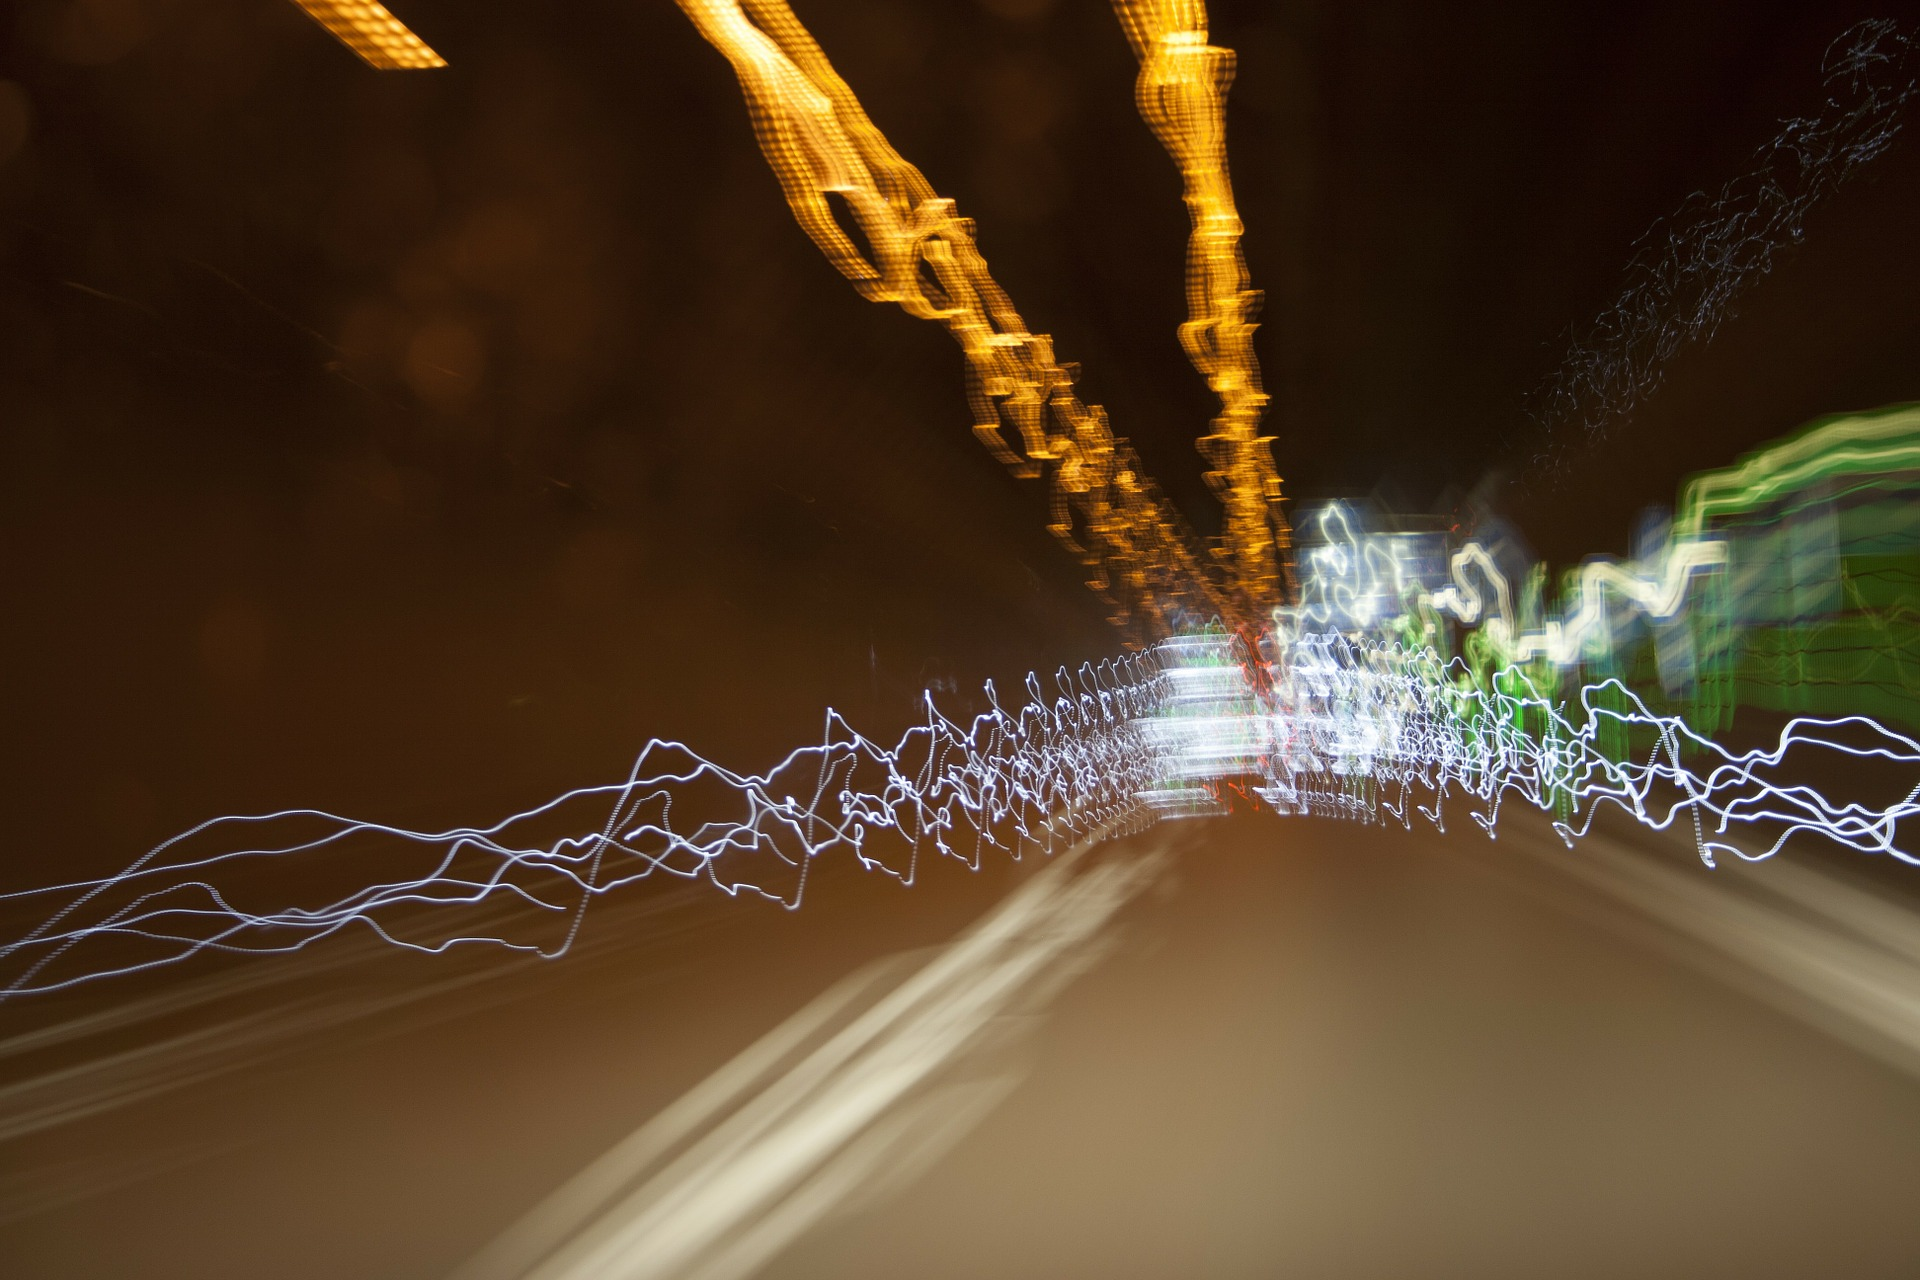 speed shake